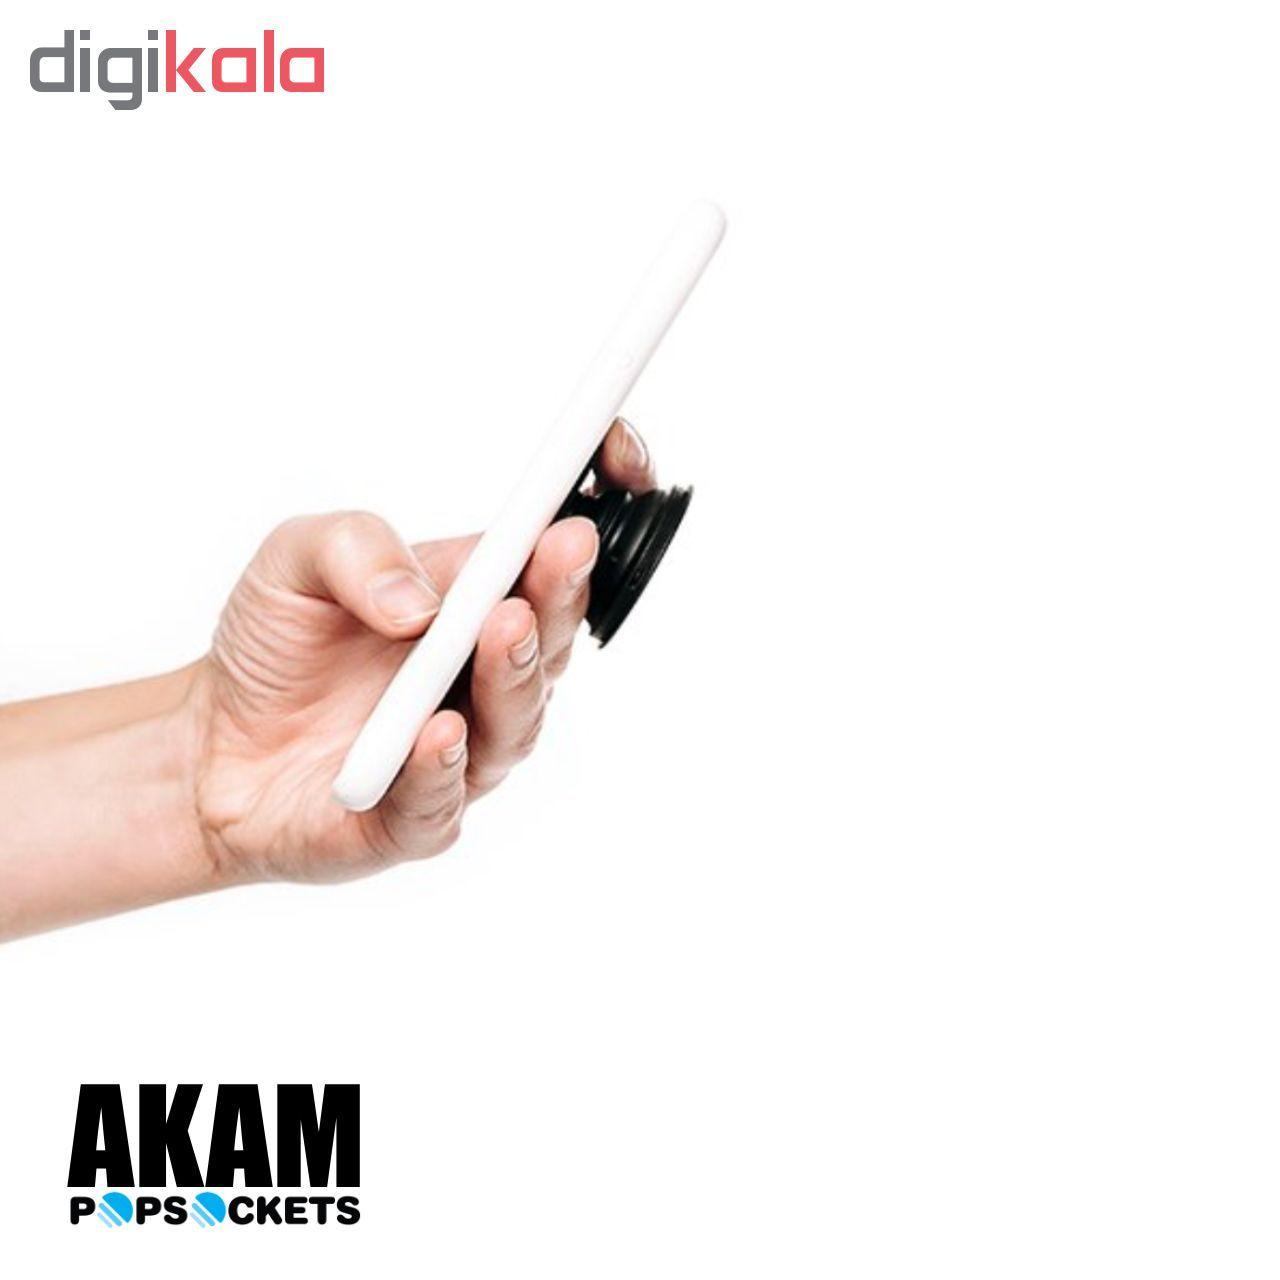 پایه نگهدارنده گوشی موبایل پاپ سوکت آکام مدل APS0068 main 1 9